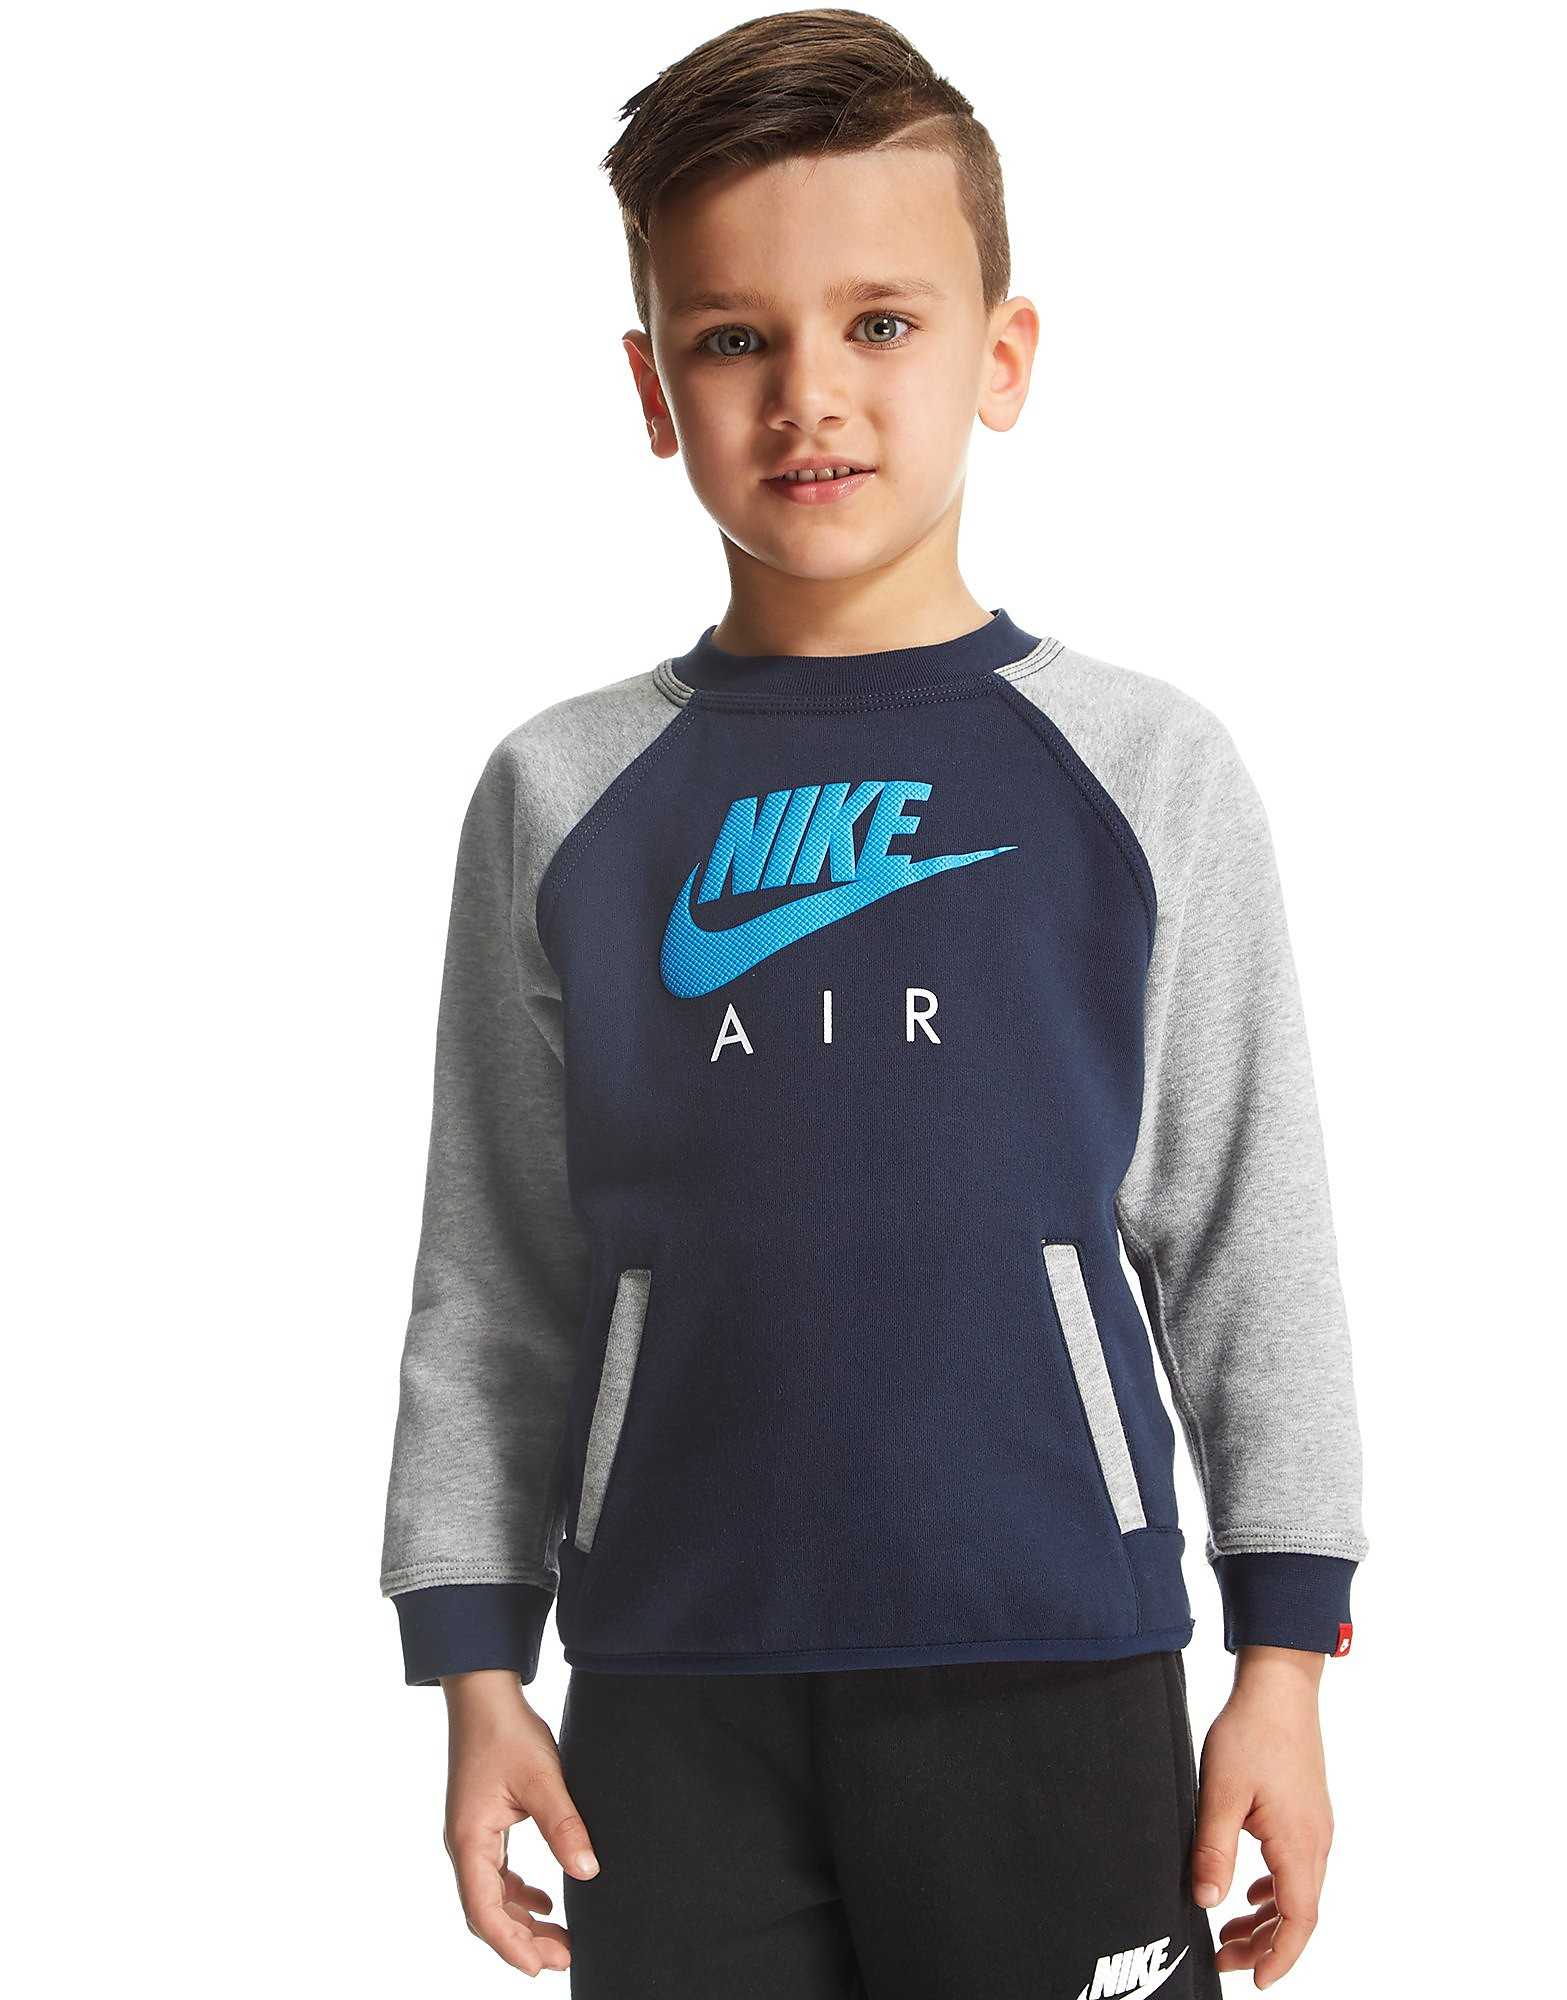 Nike Air Crew Sweater Children